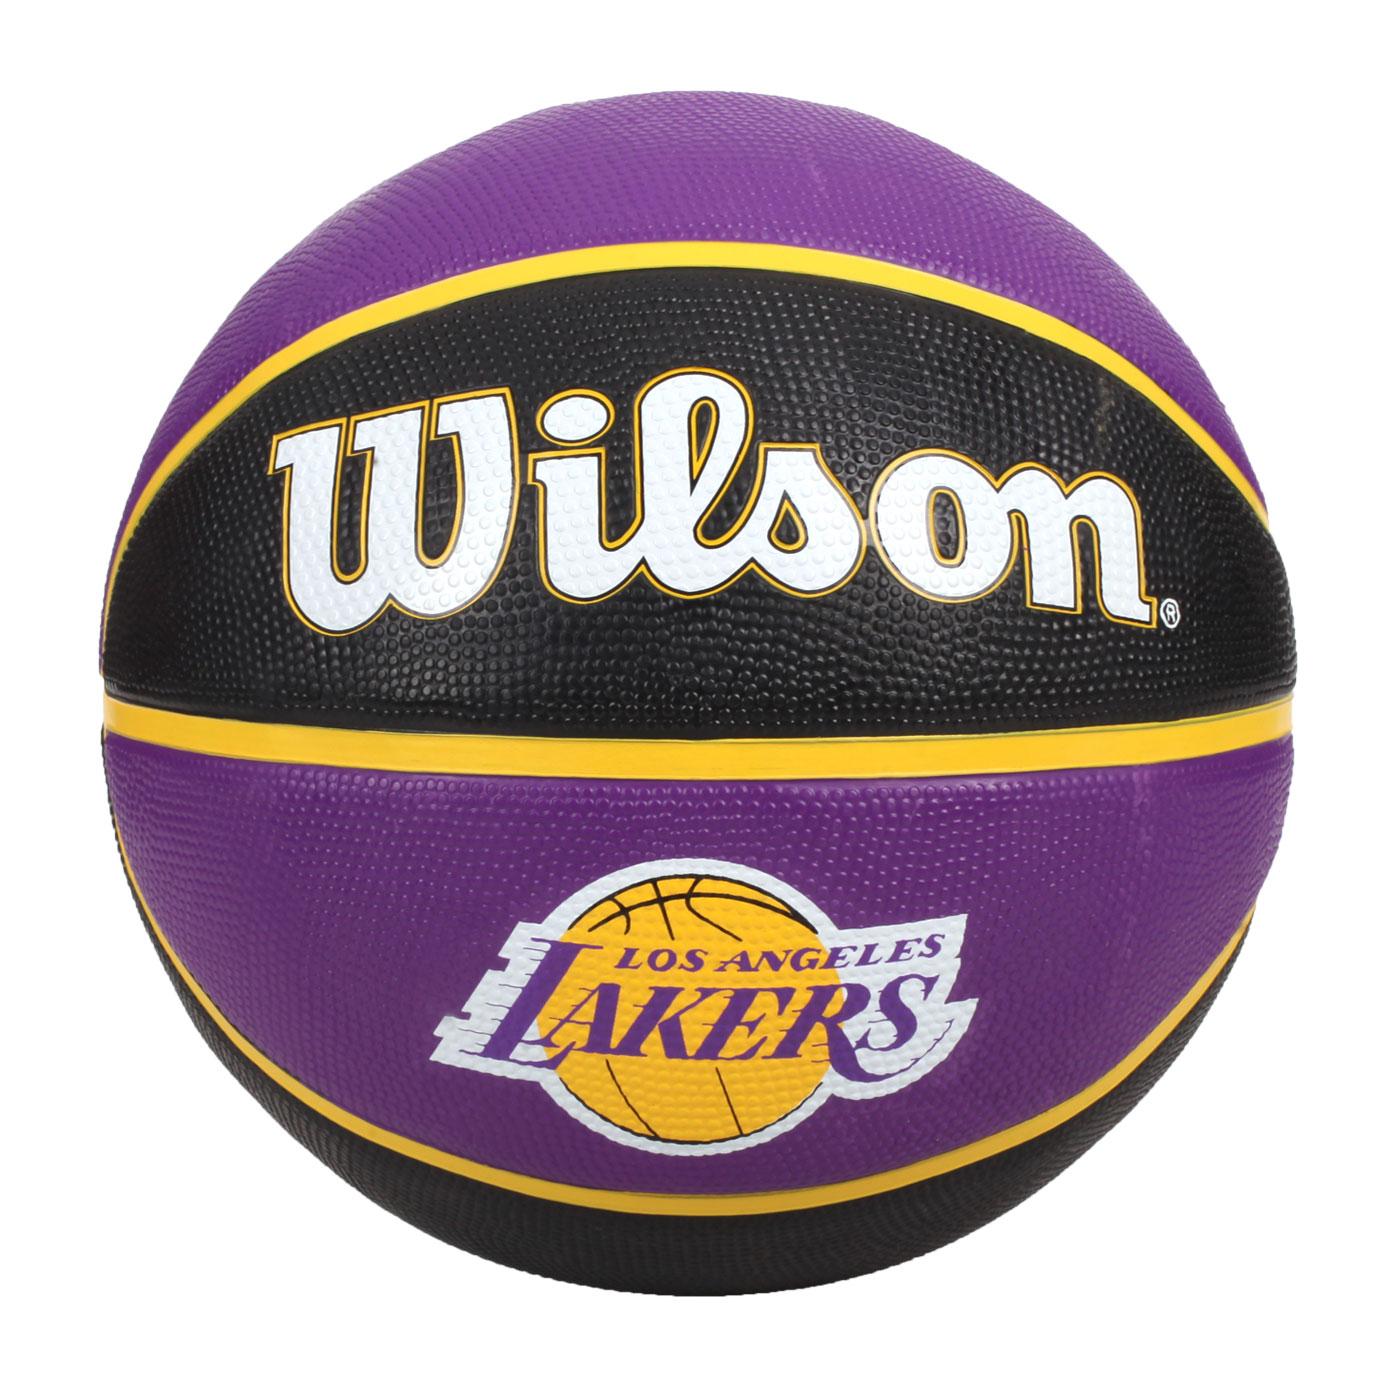 WILSON NBA隊徽系列21' 湖人隊橡膠籃球#7 WTB1300XBLAL - 黑紫黃白